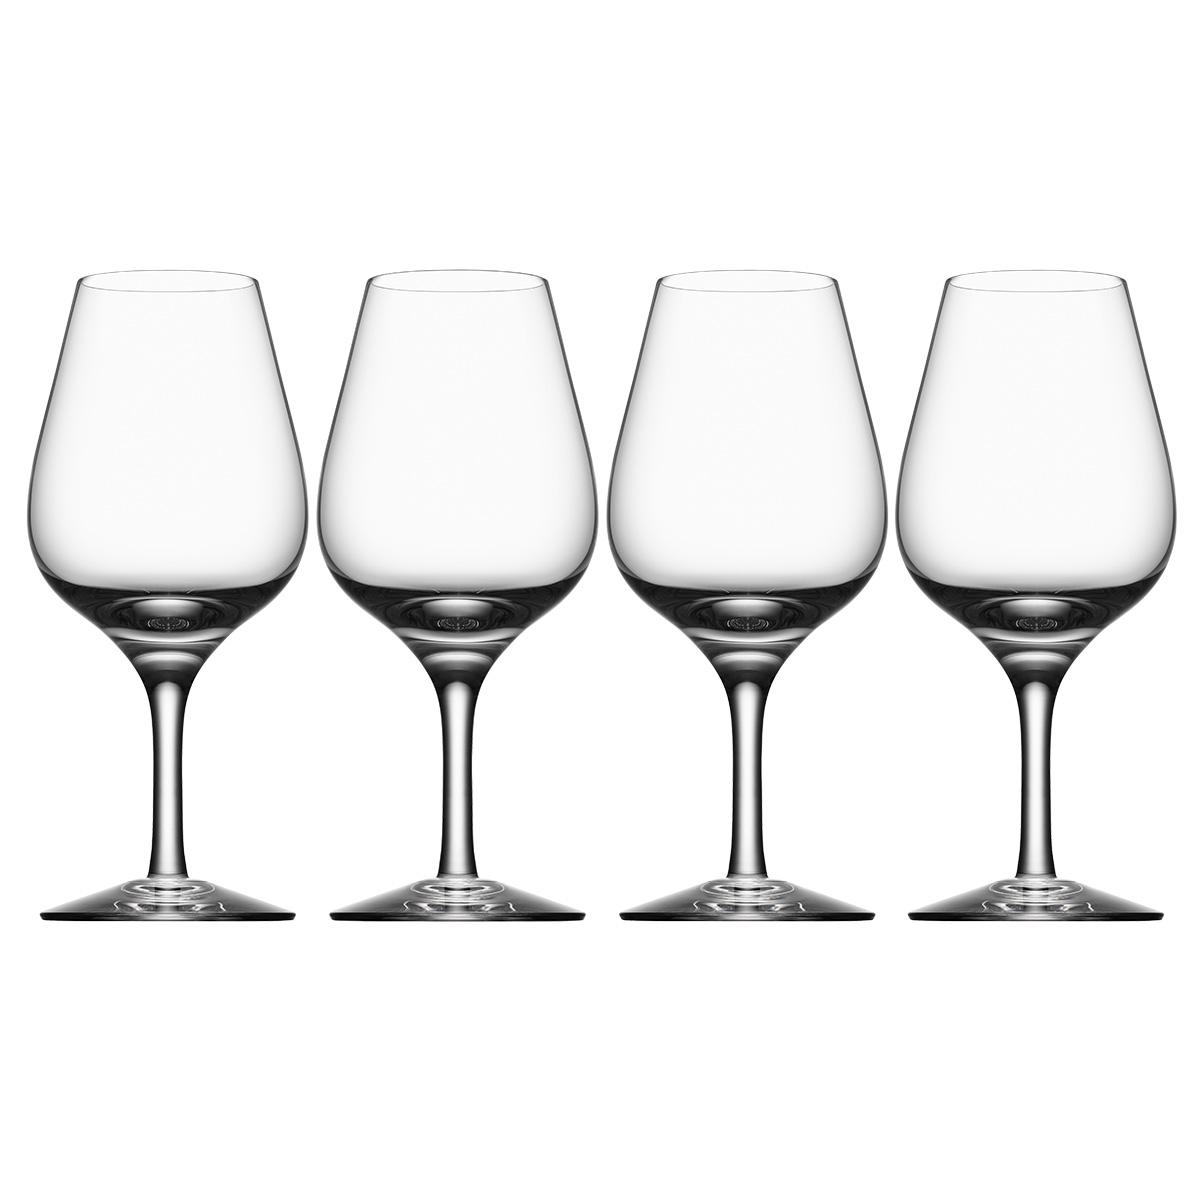 Image of   Orrefors cognacglas - More Spirits - 4 stk.